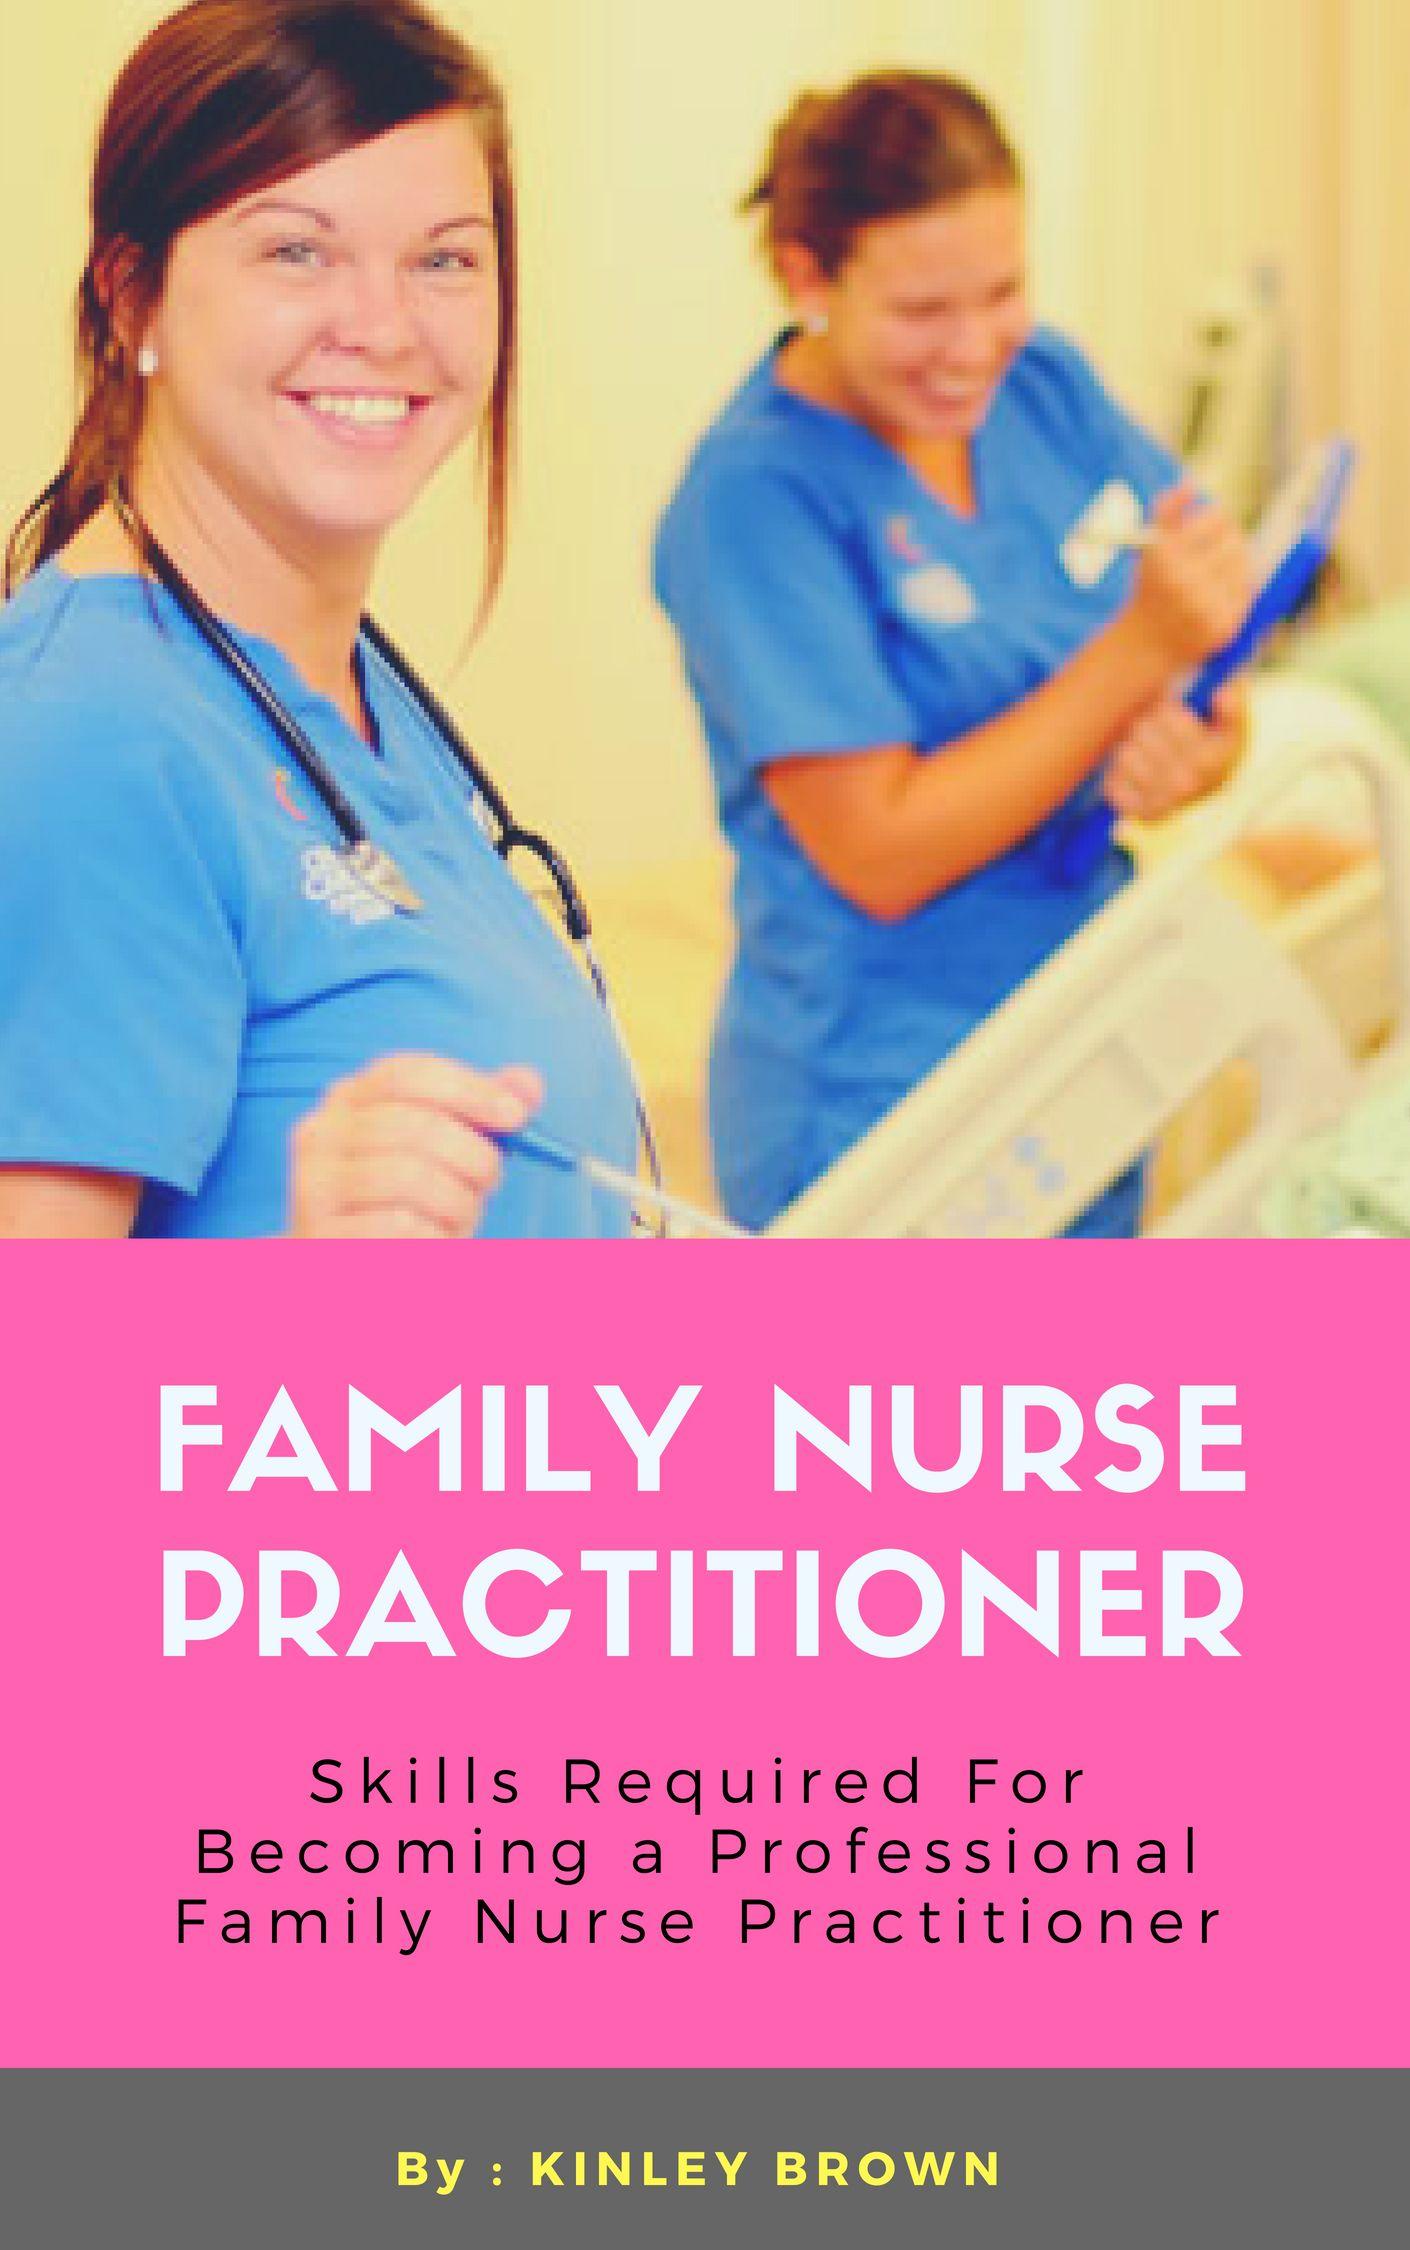 Family Nurse Practitioner Fnp Job Description And Certification Salary Guide Regi Family Nurse Practitioner Nurse Practitioner Nurse Practitioner Student